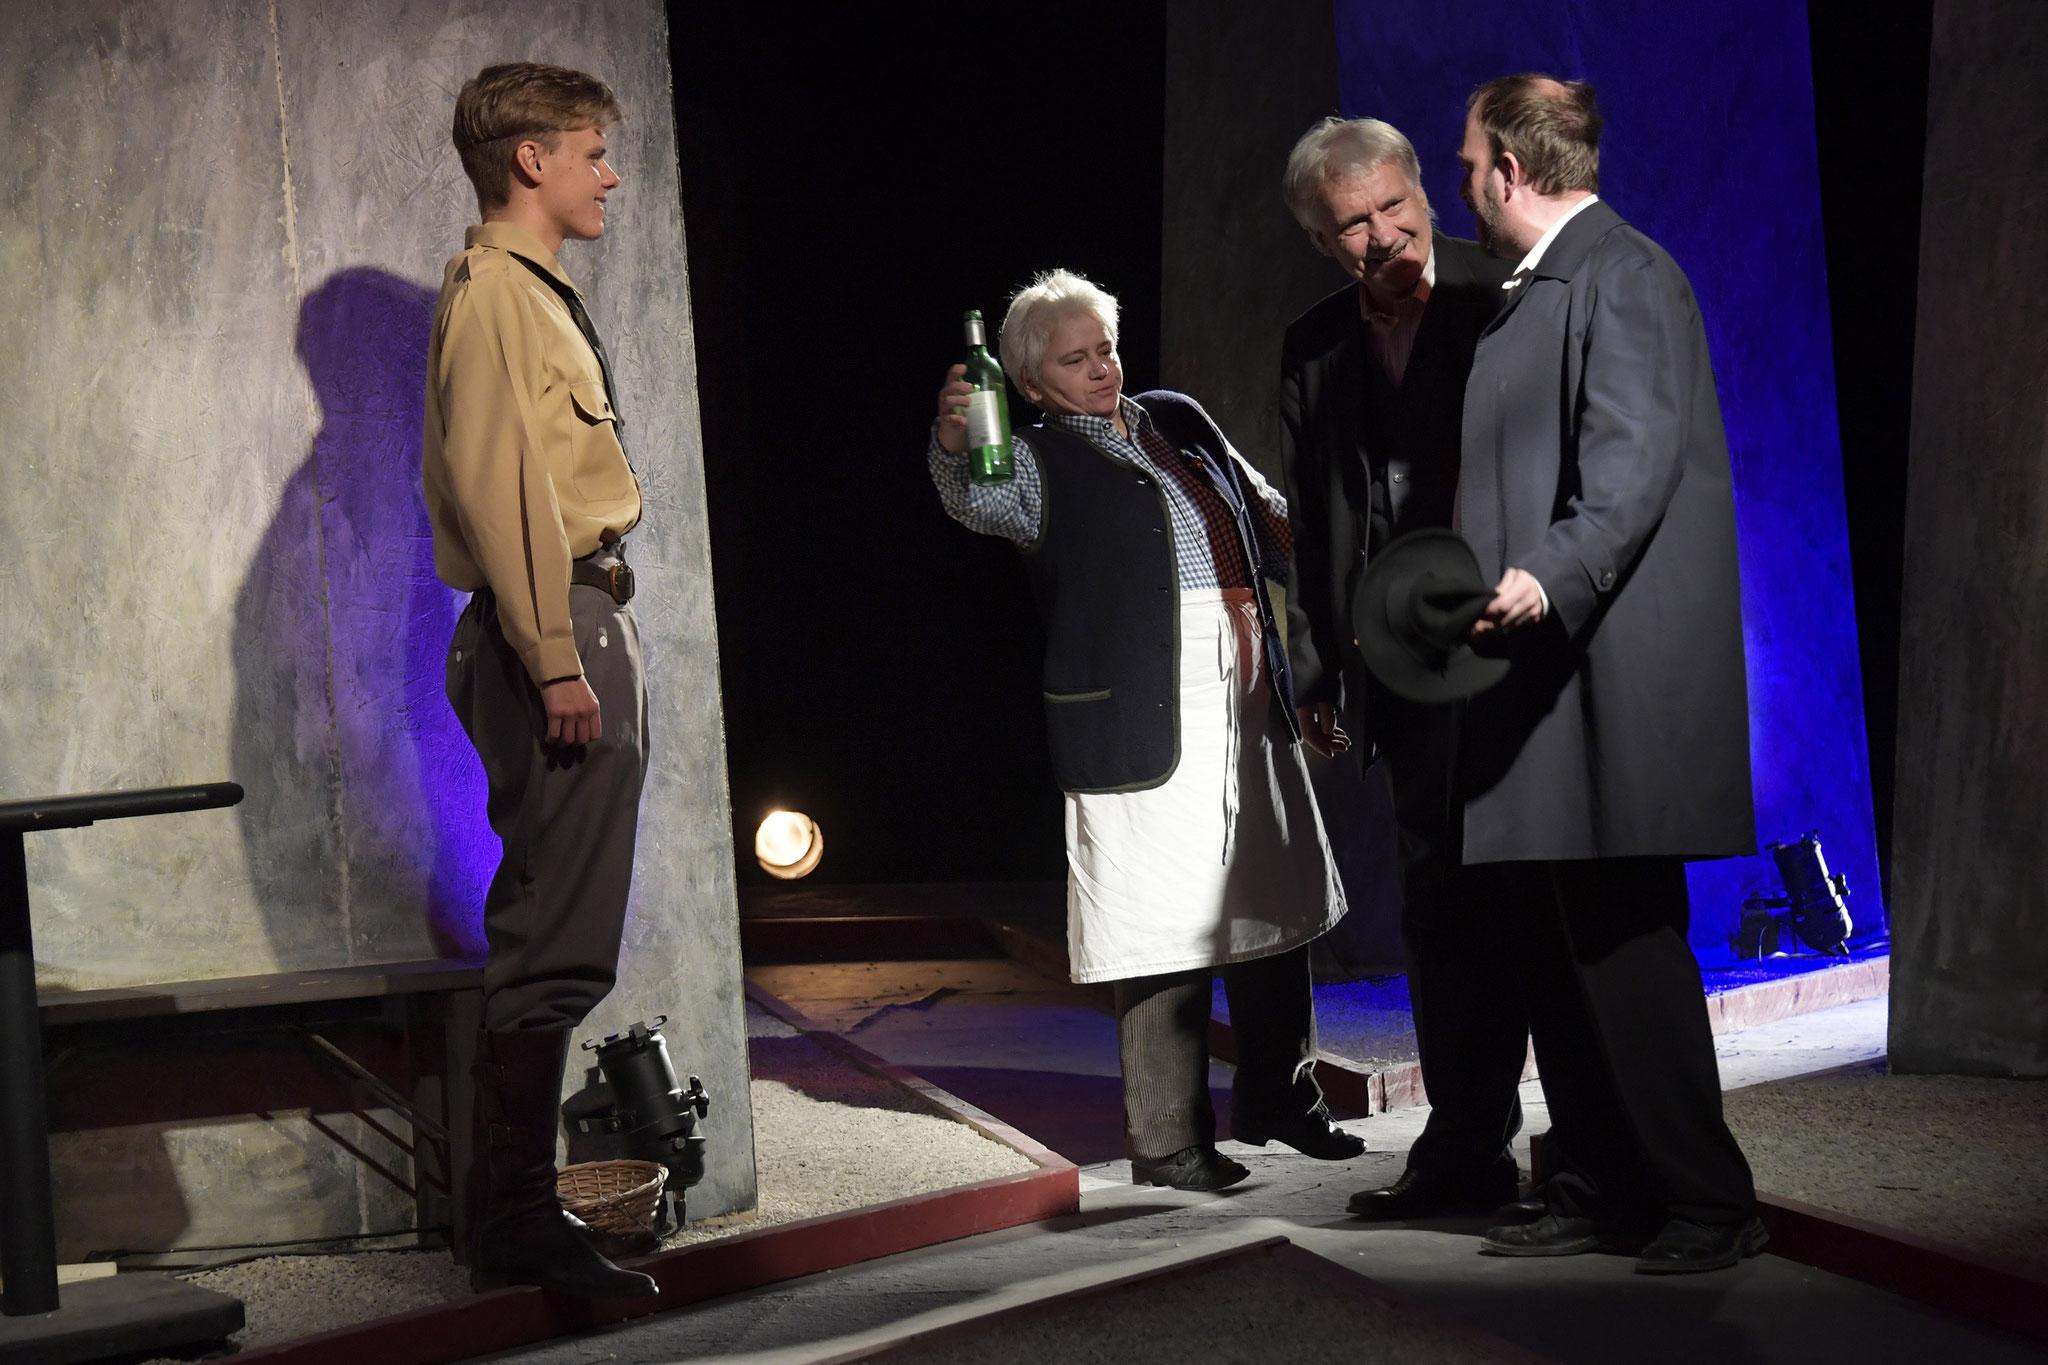 Patrick Paukner, Doris Linninger, Kurt Engelmann, Thomas Zimmermann